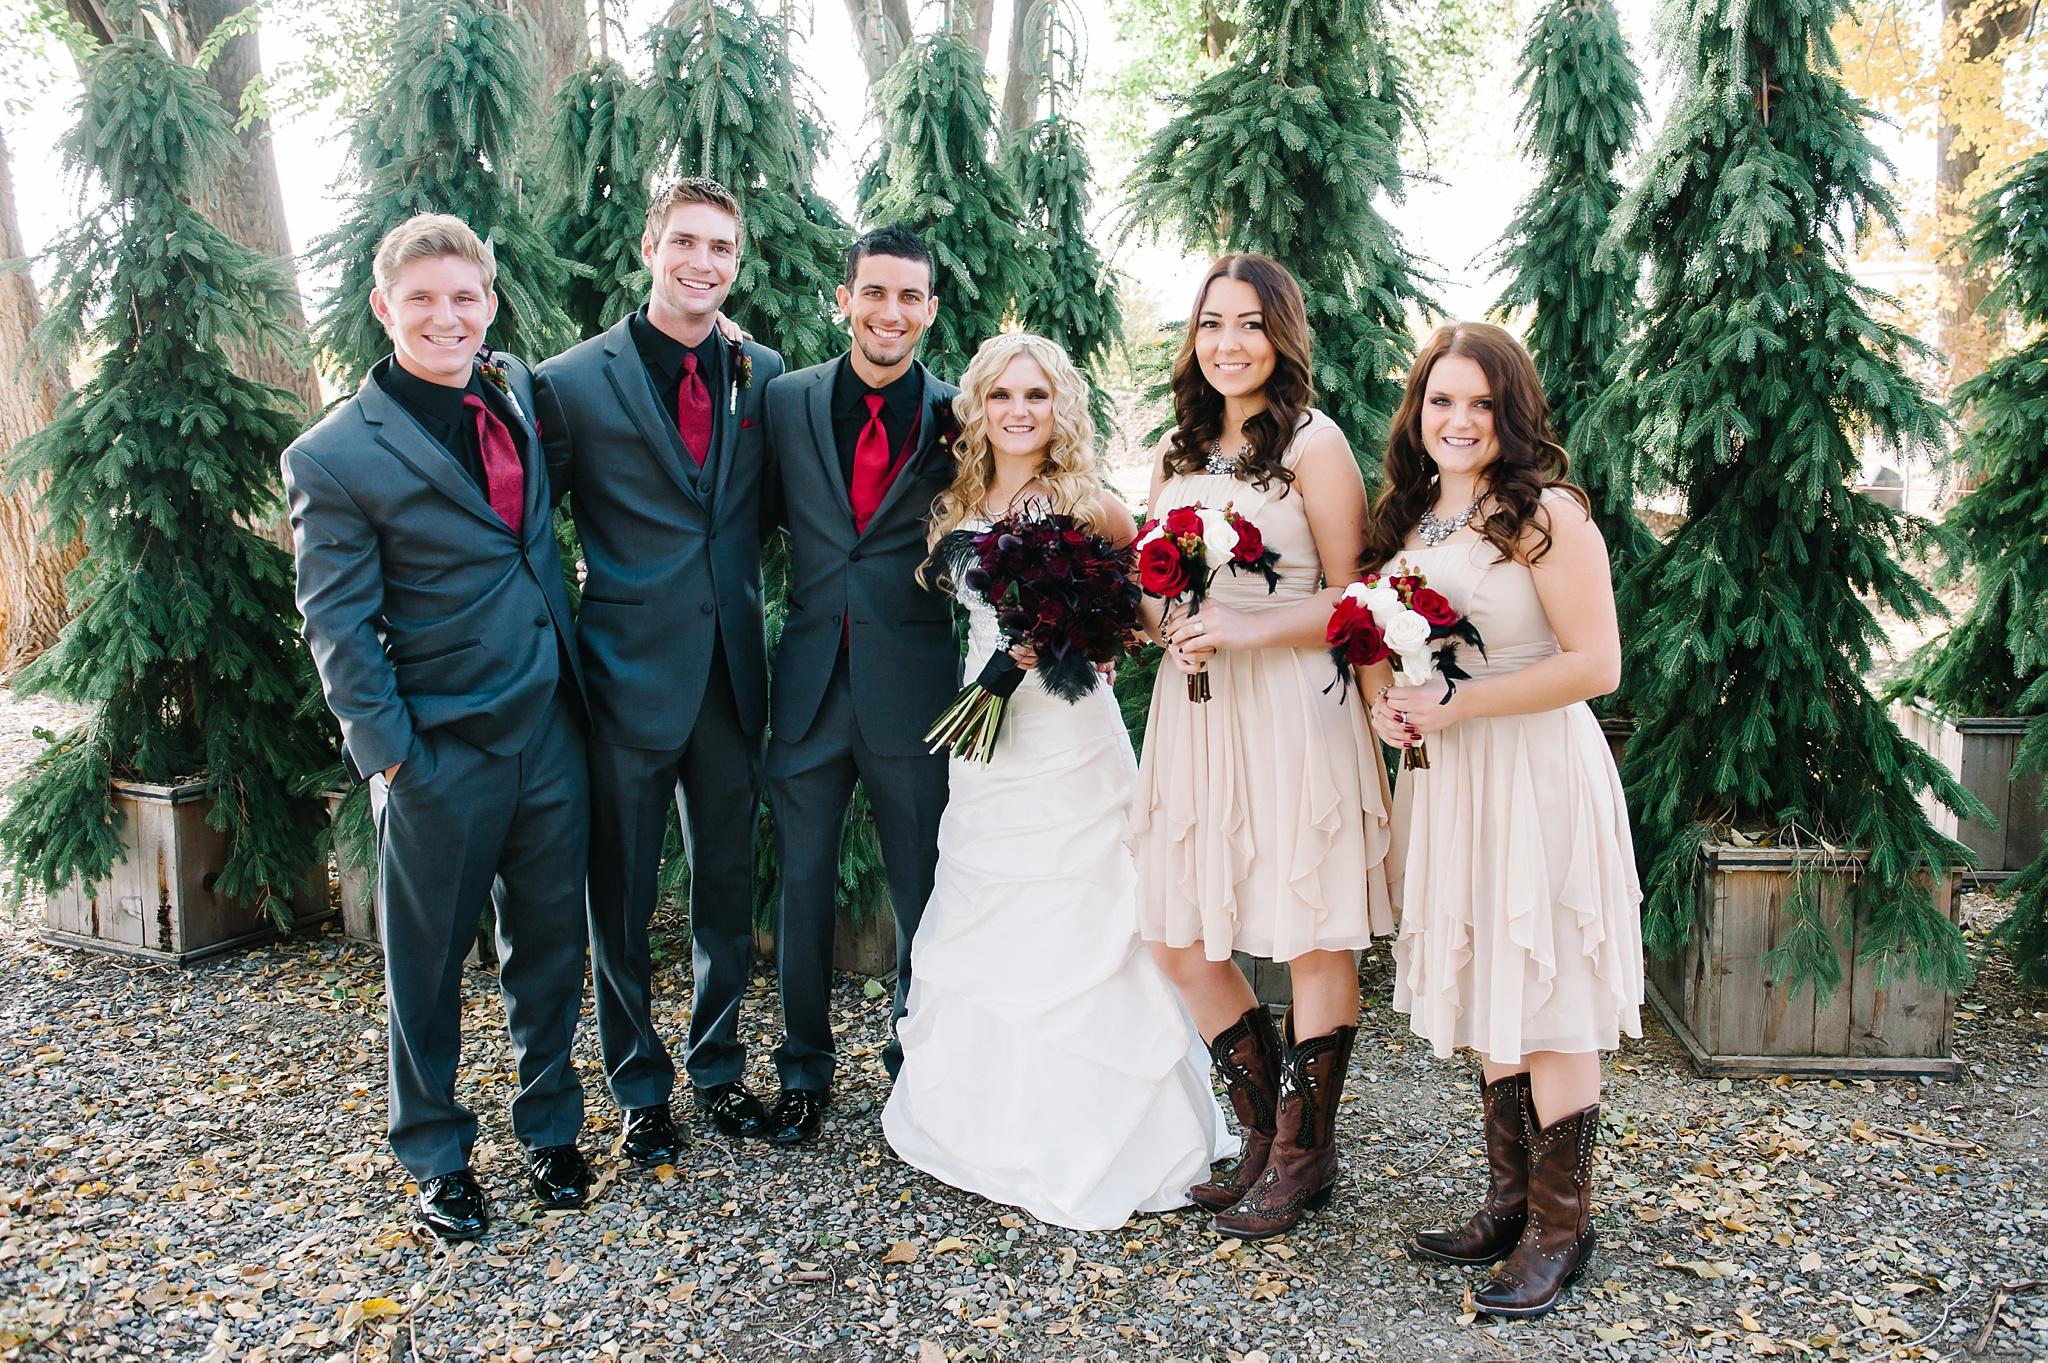 SLC Utah Wedding Photographer Ali Sumsion 070